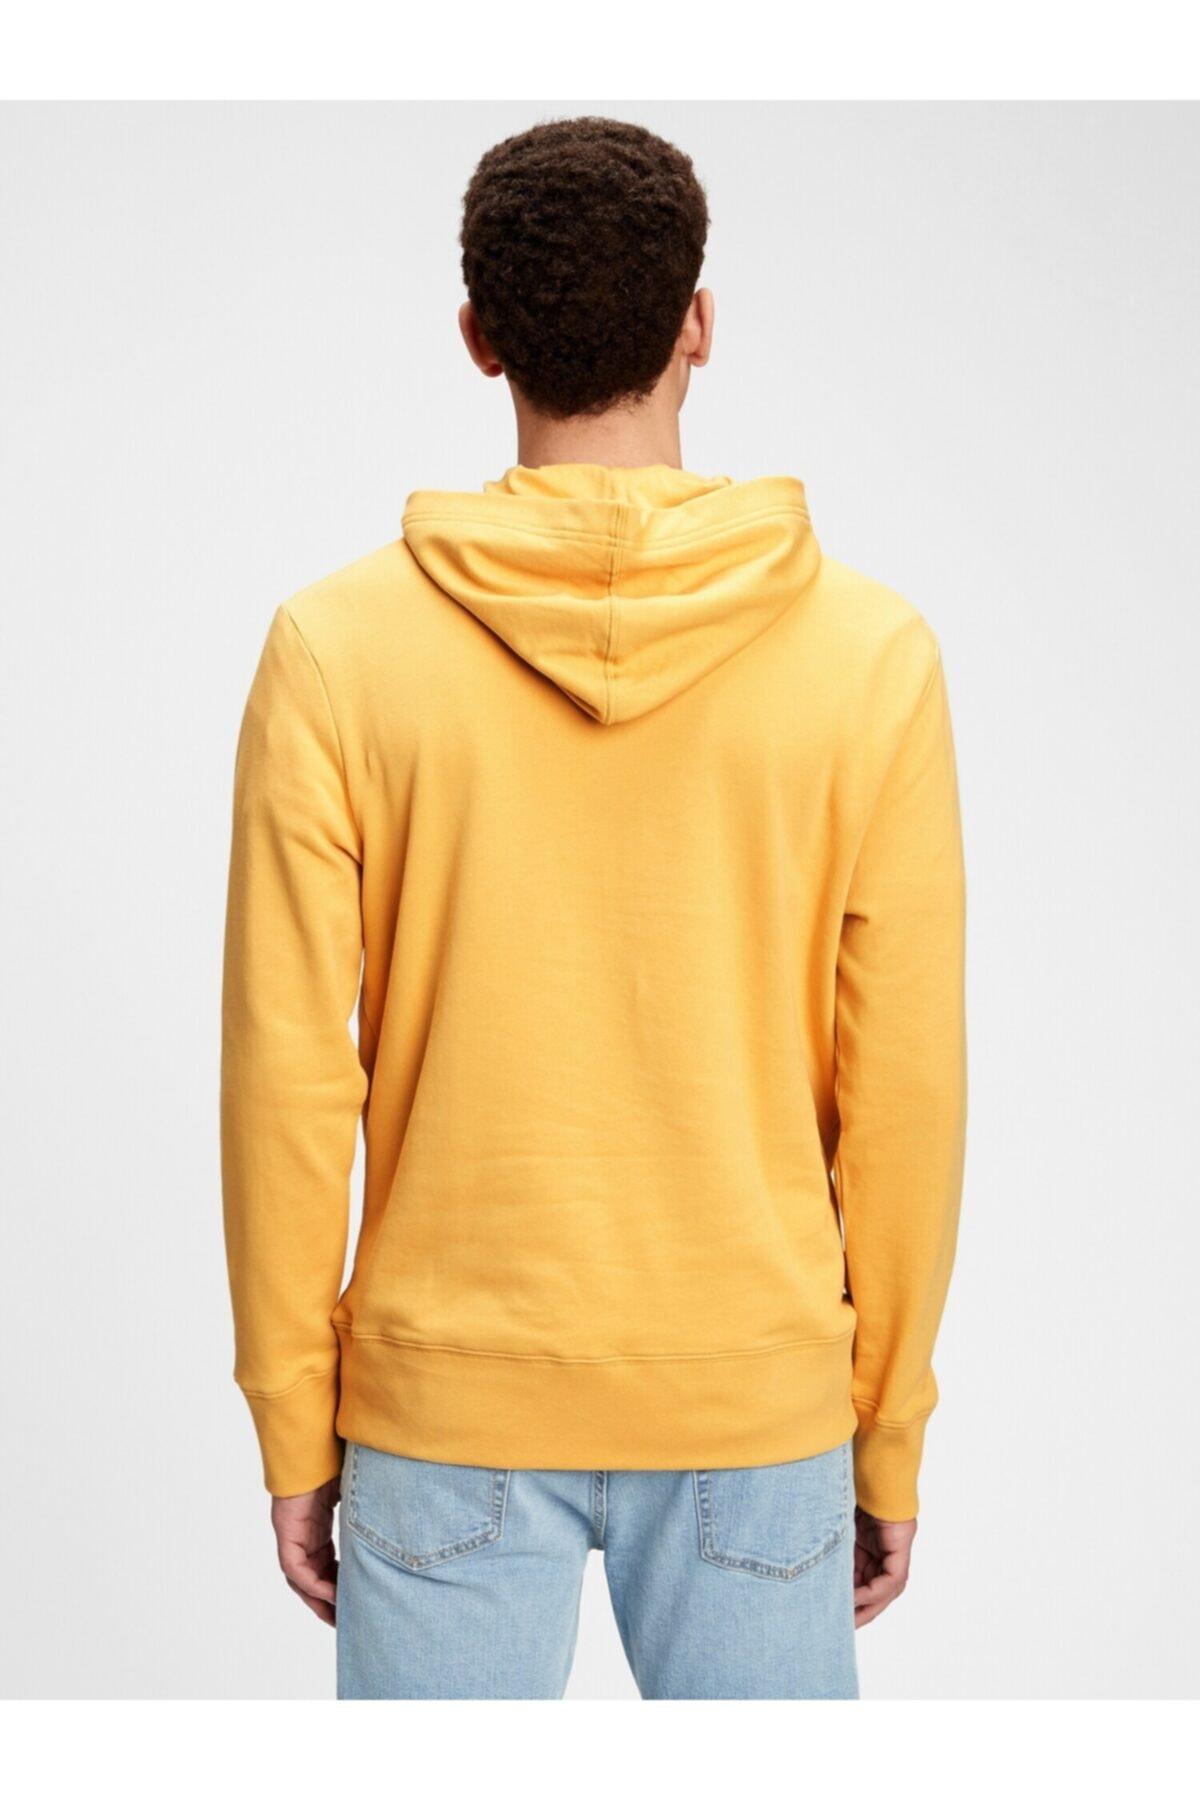 GAP Logo Kapüşonlu Sweatshirt 2